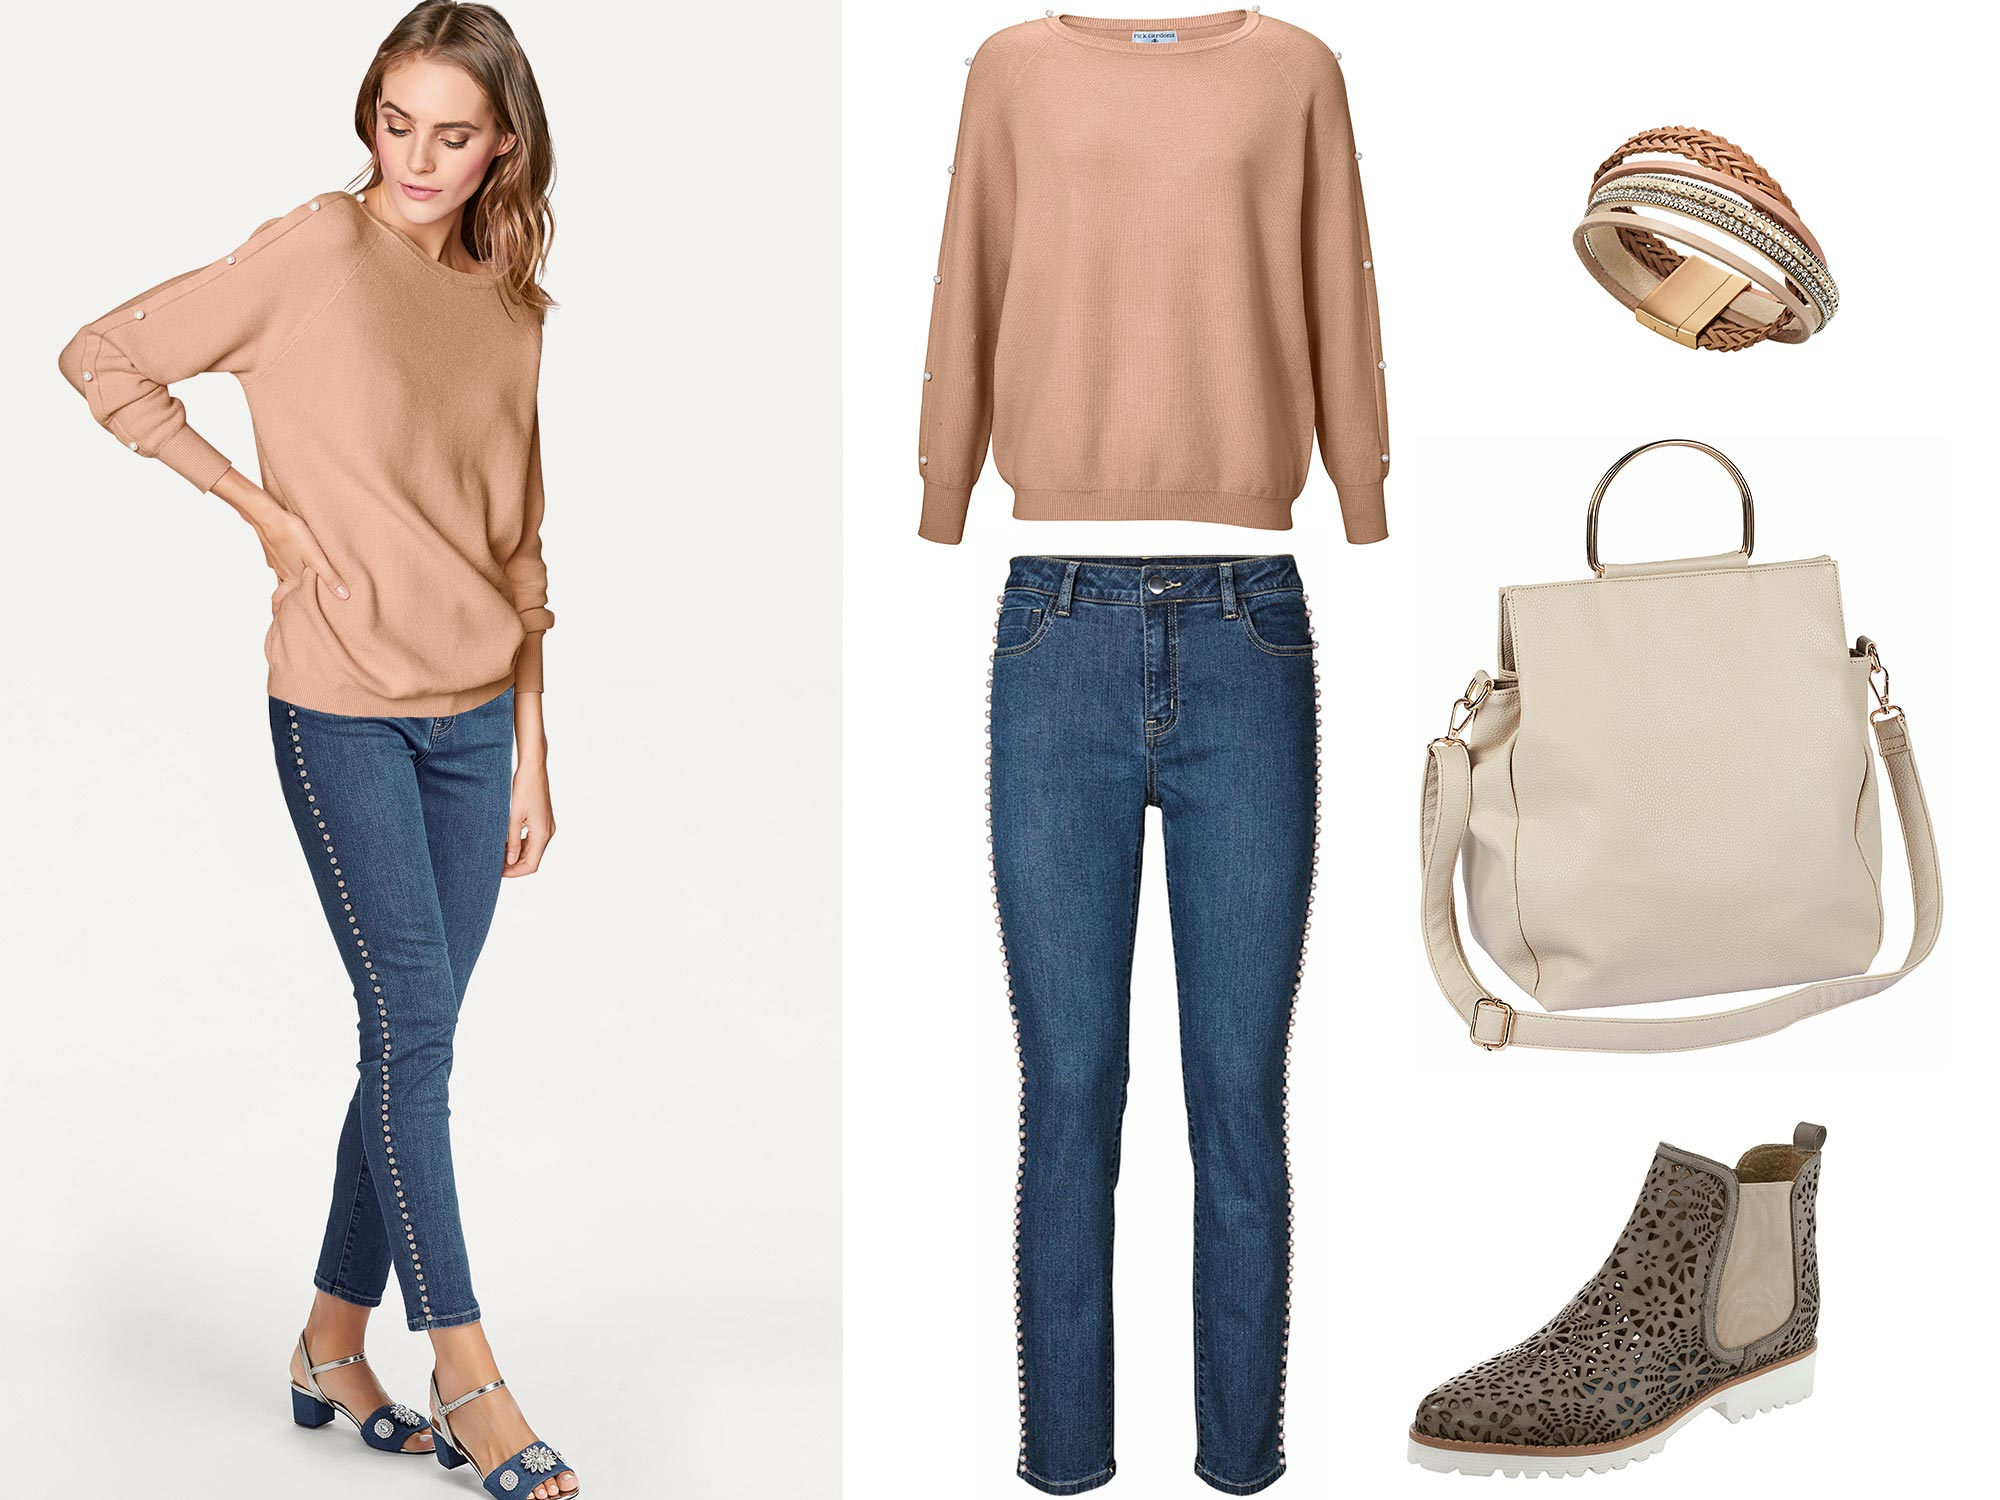 Outfit des Monats Januar, kuscheliger Pullover und Perlen-Jeans